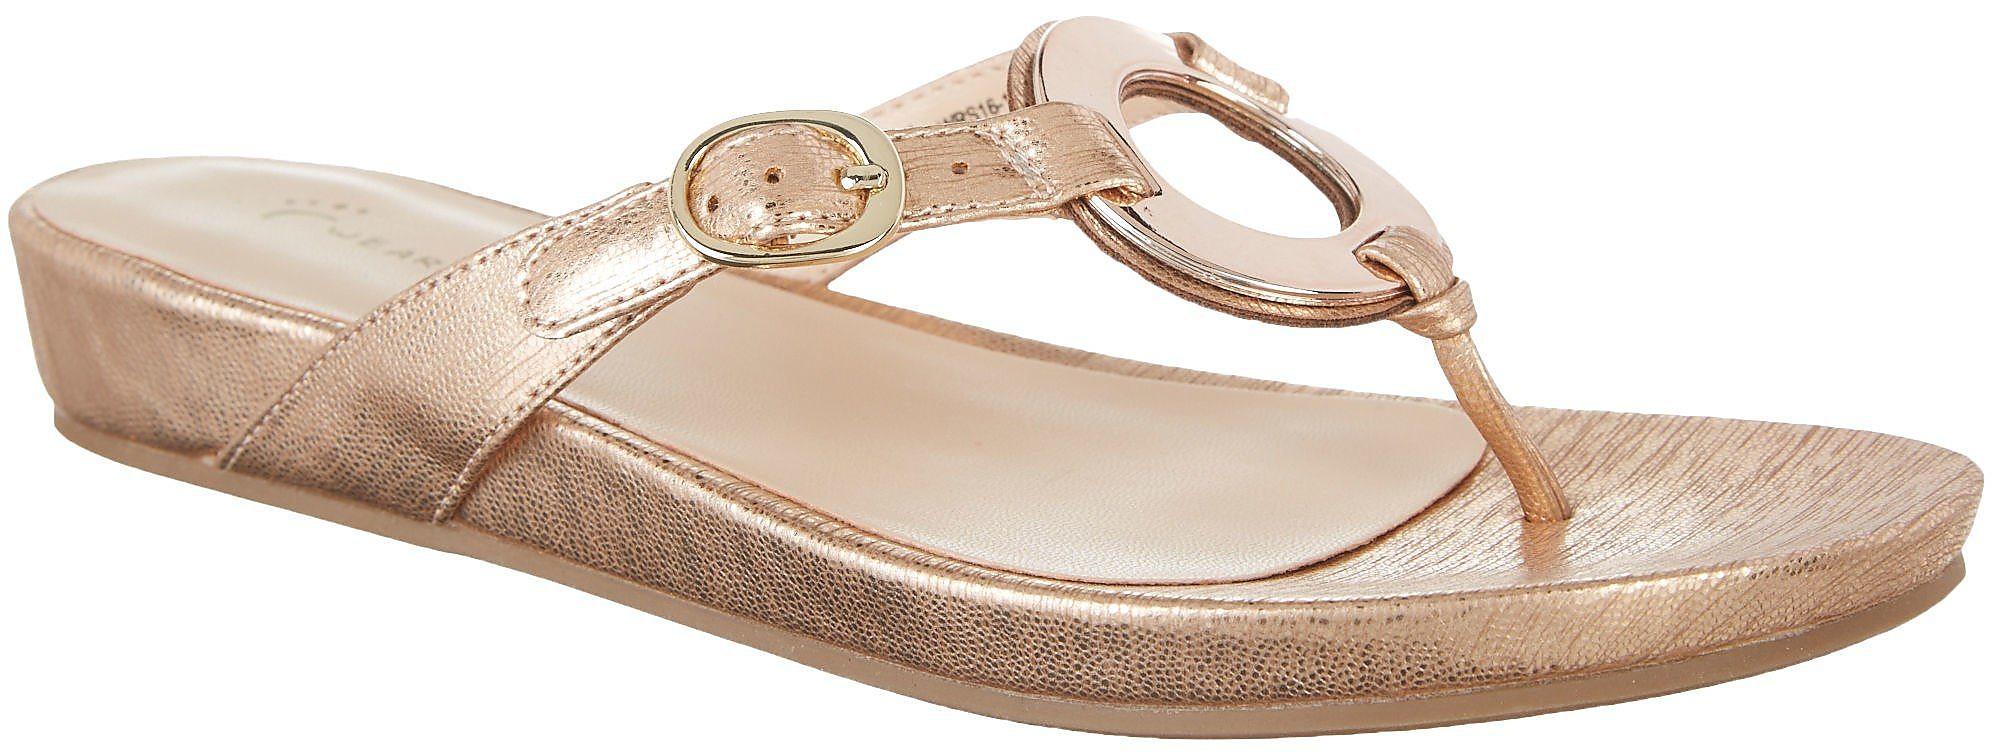 370cd616b Wear Ever by Bare Traps Womens Mennie Thong Sandals